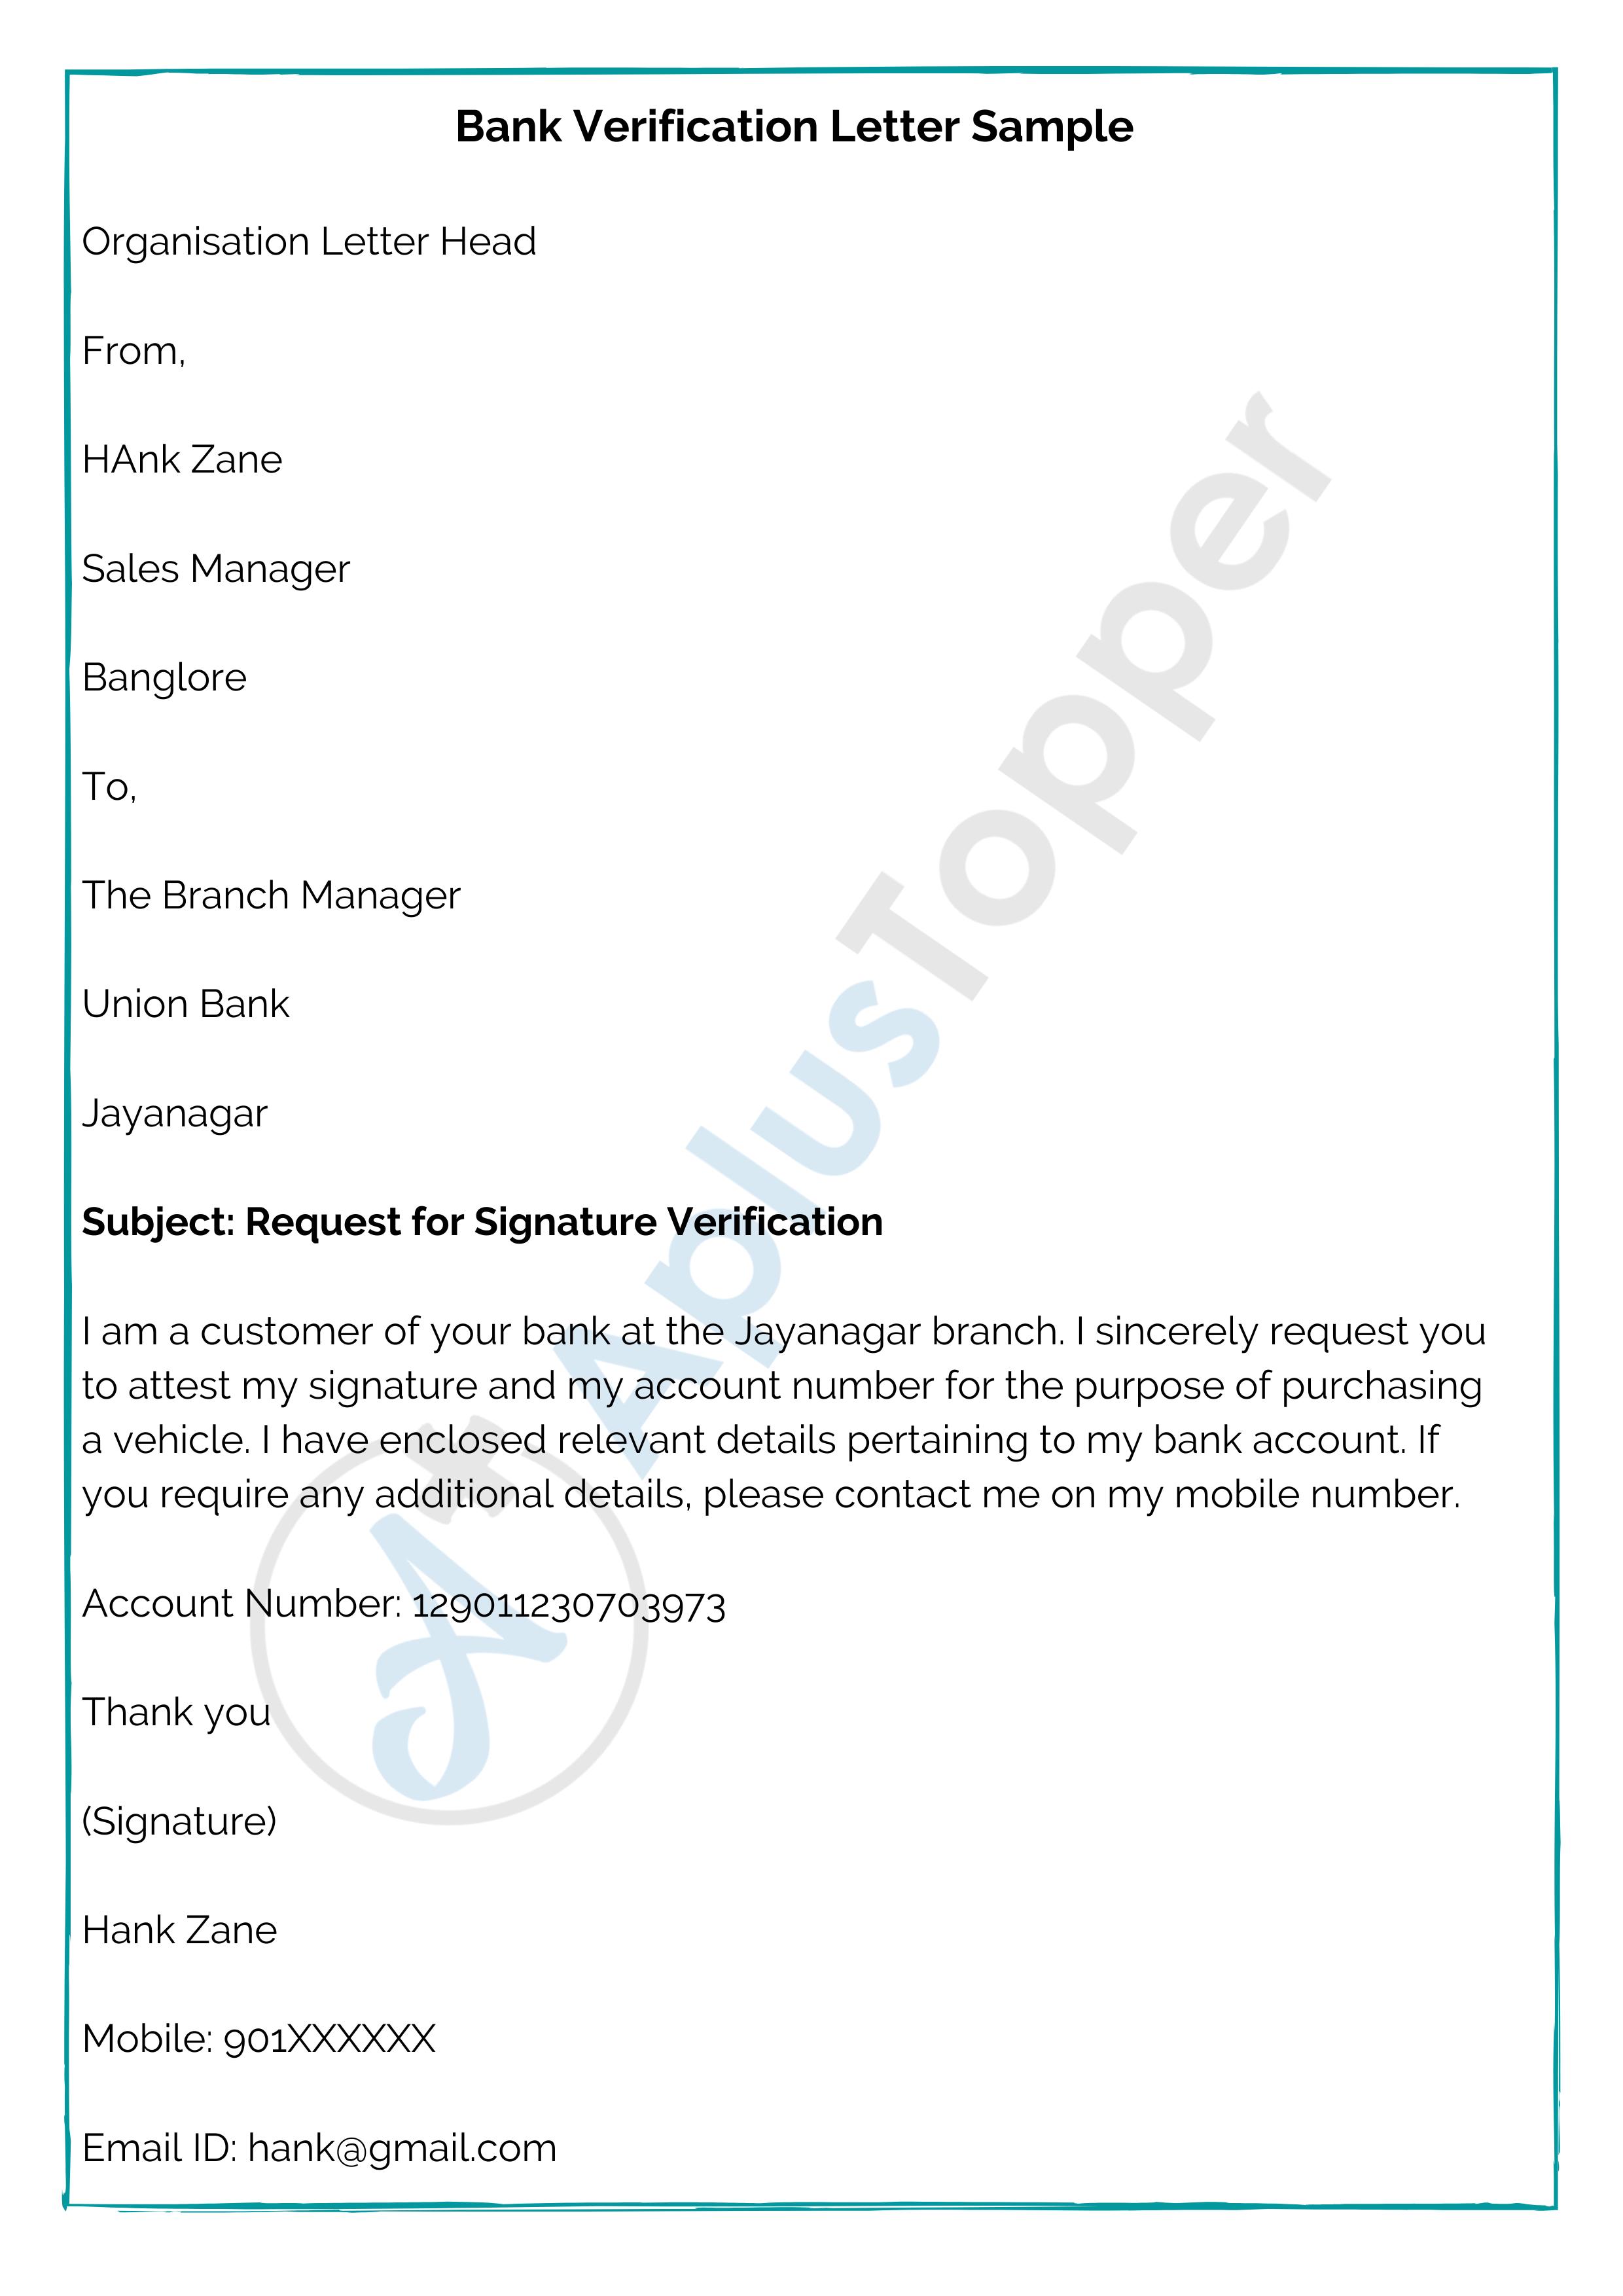 Bank Verification Letter Sample